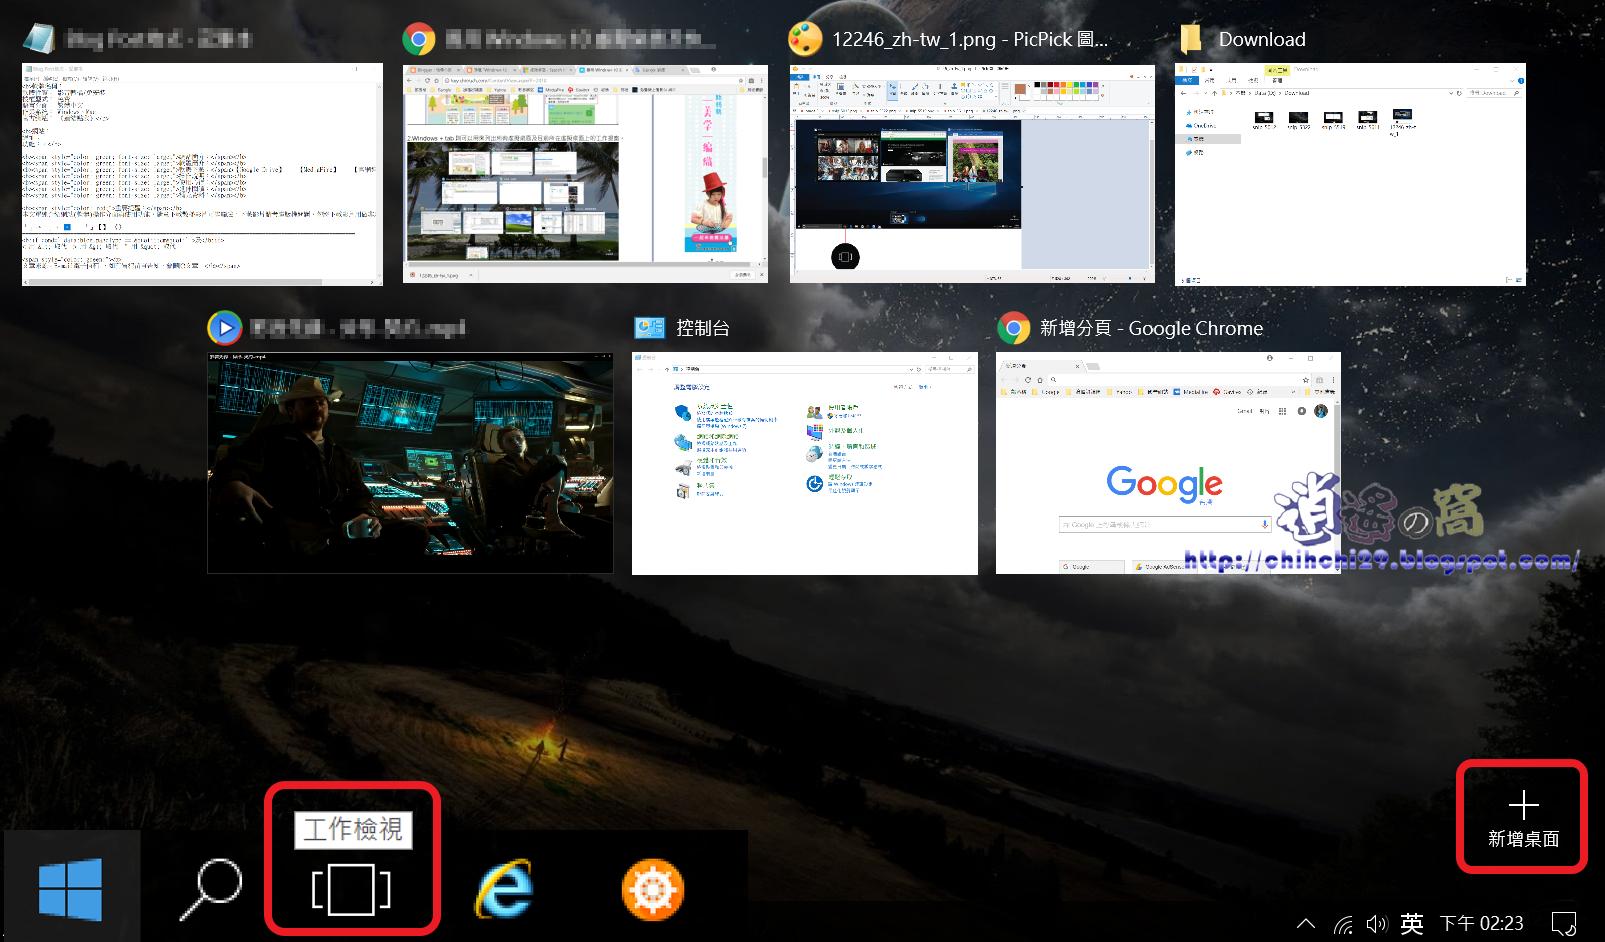 Windows 10 虛擬桌面